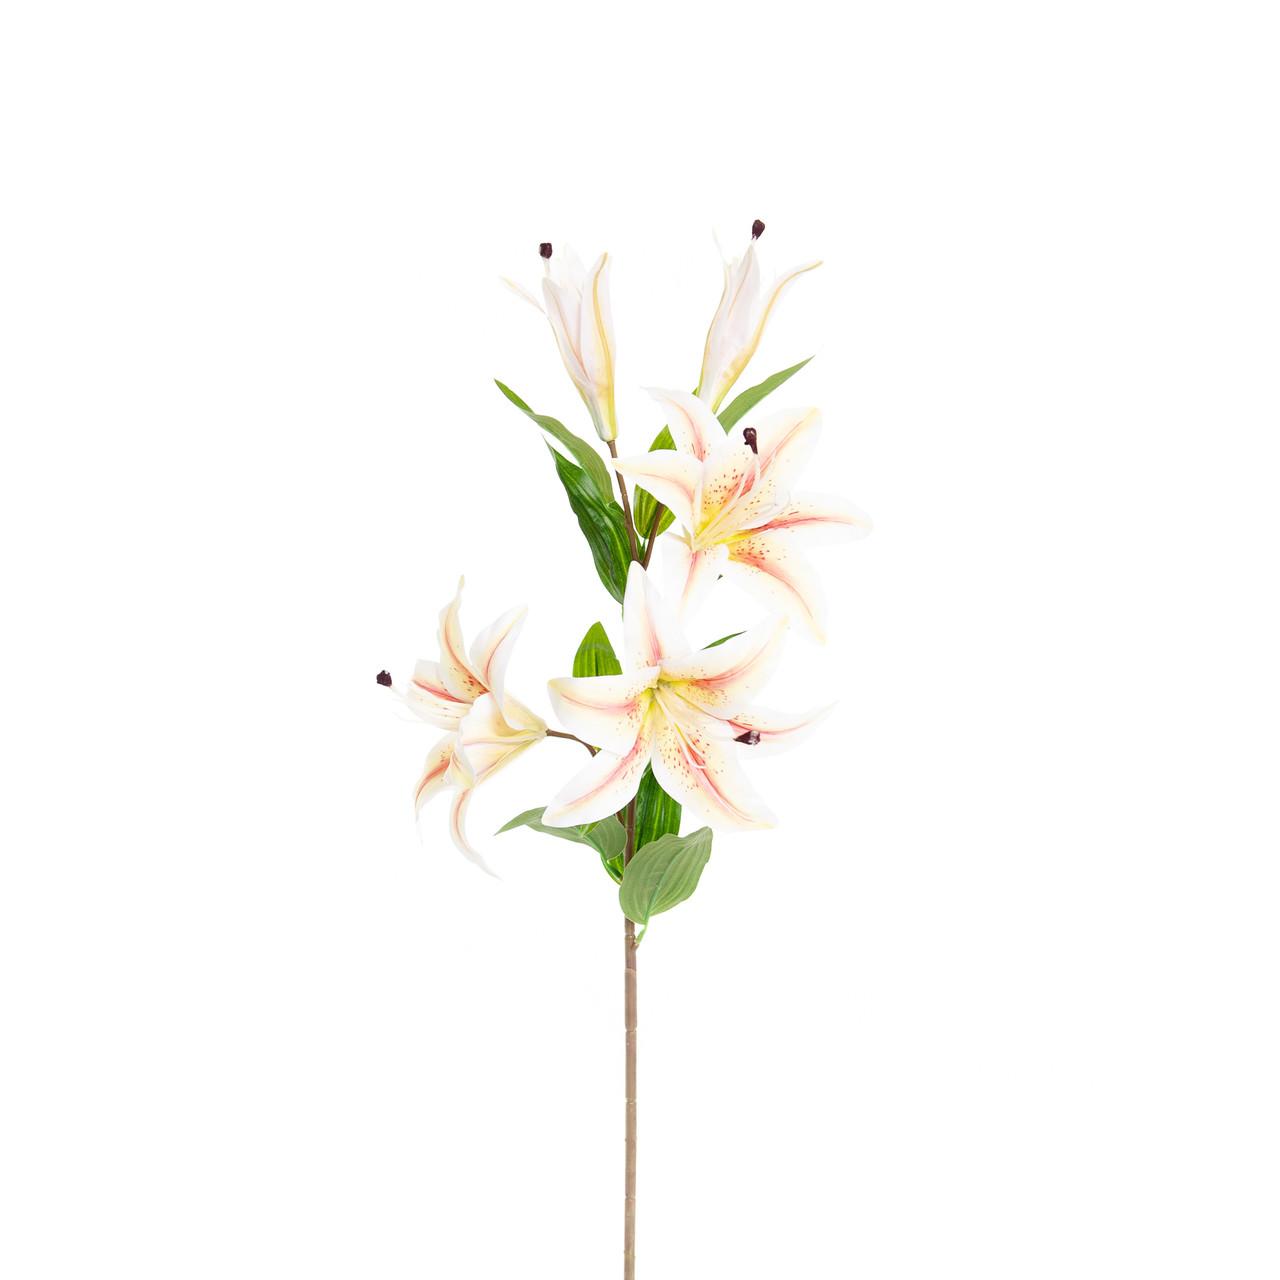 Kunst Lelie 85 cm vanille/roze/wit